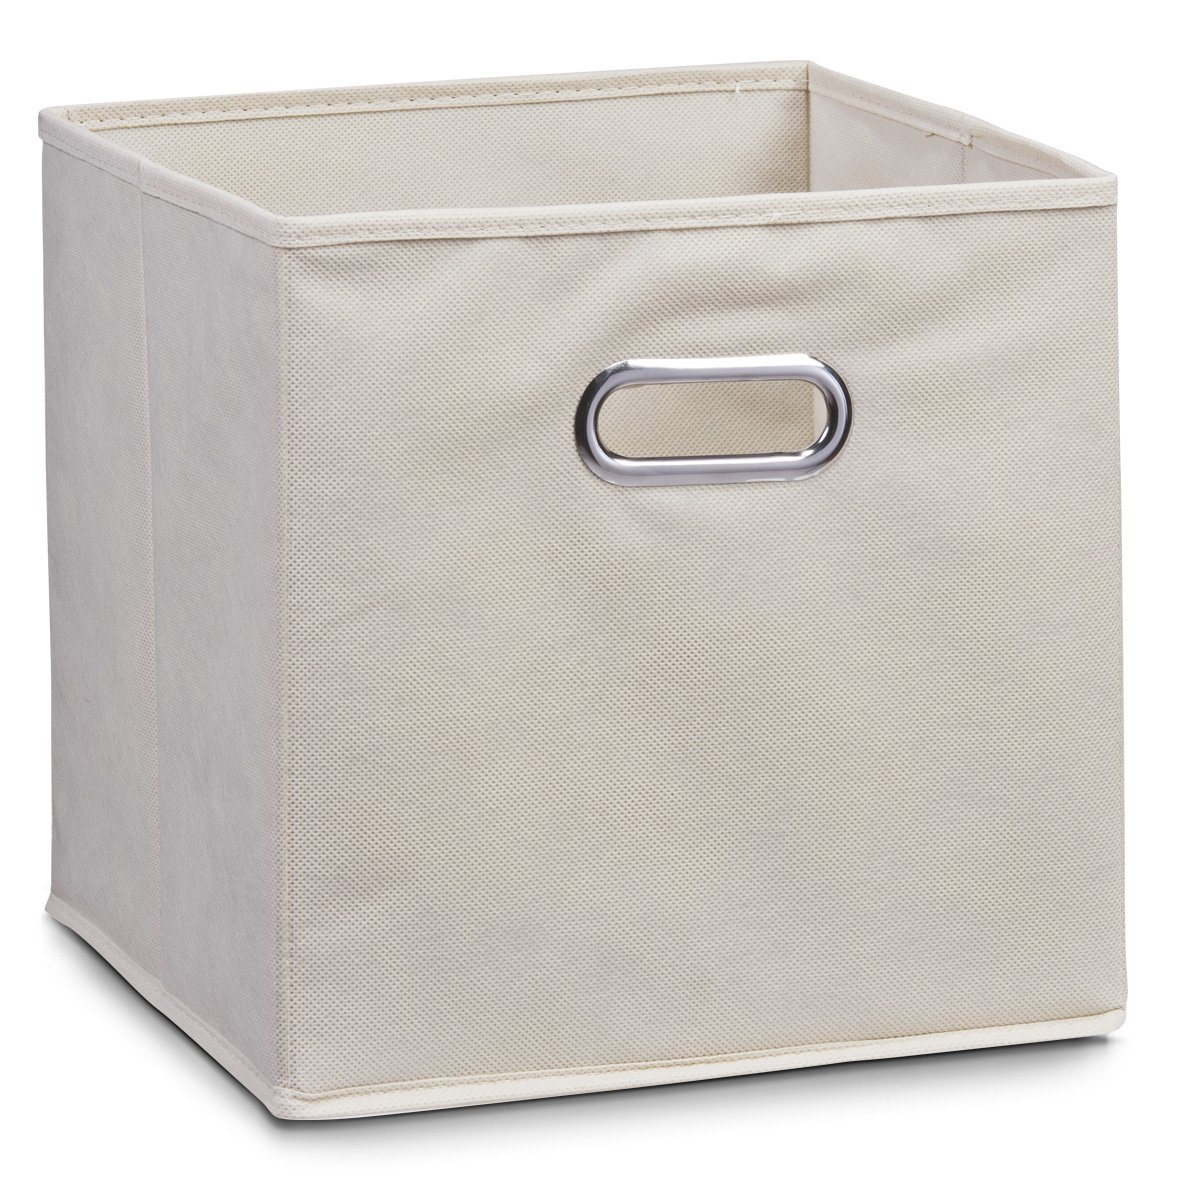 Zeller Storage Box, Grey, Fleece 32x32x32, Fabric 14110